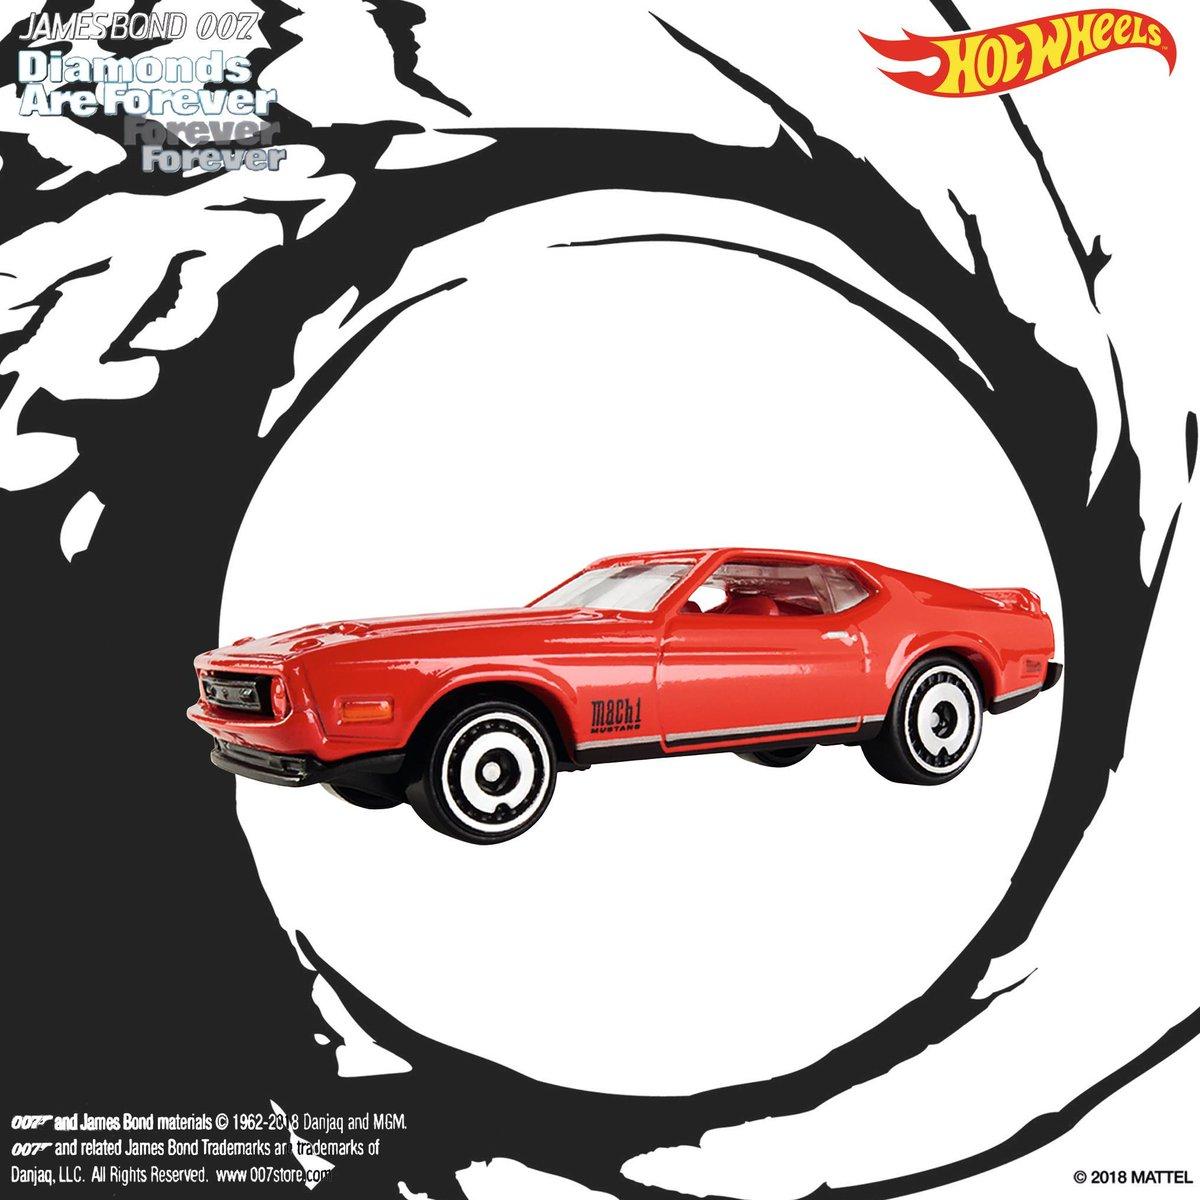 Hot Wheels James Bond 007 Mustang Diamonds Are Forever